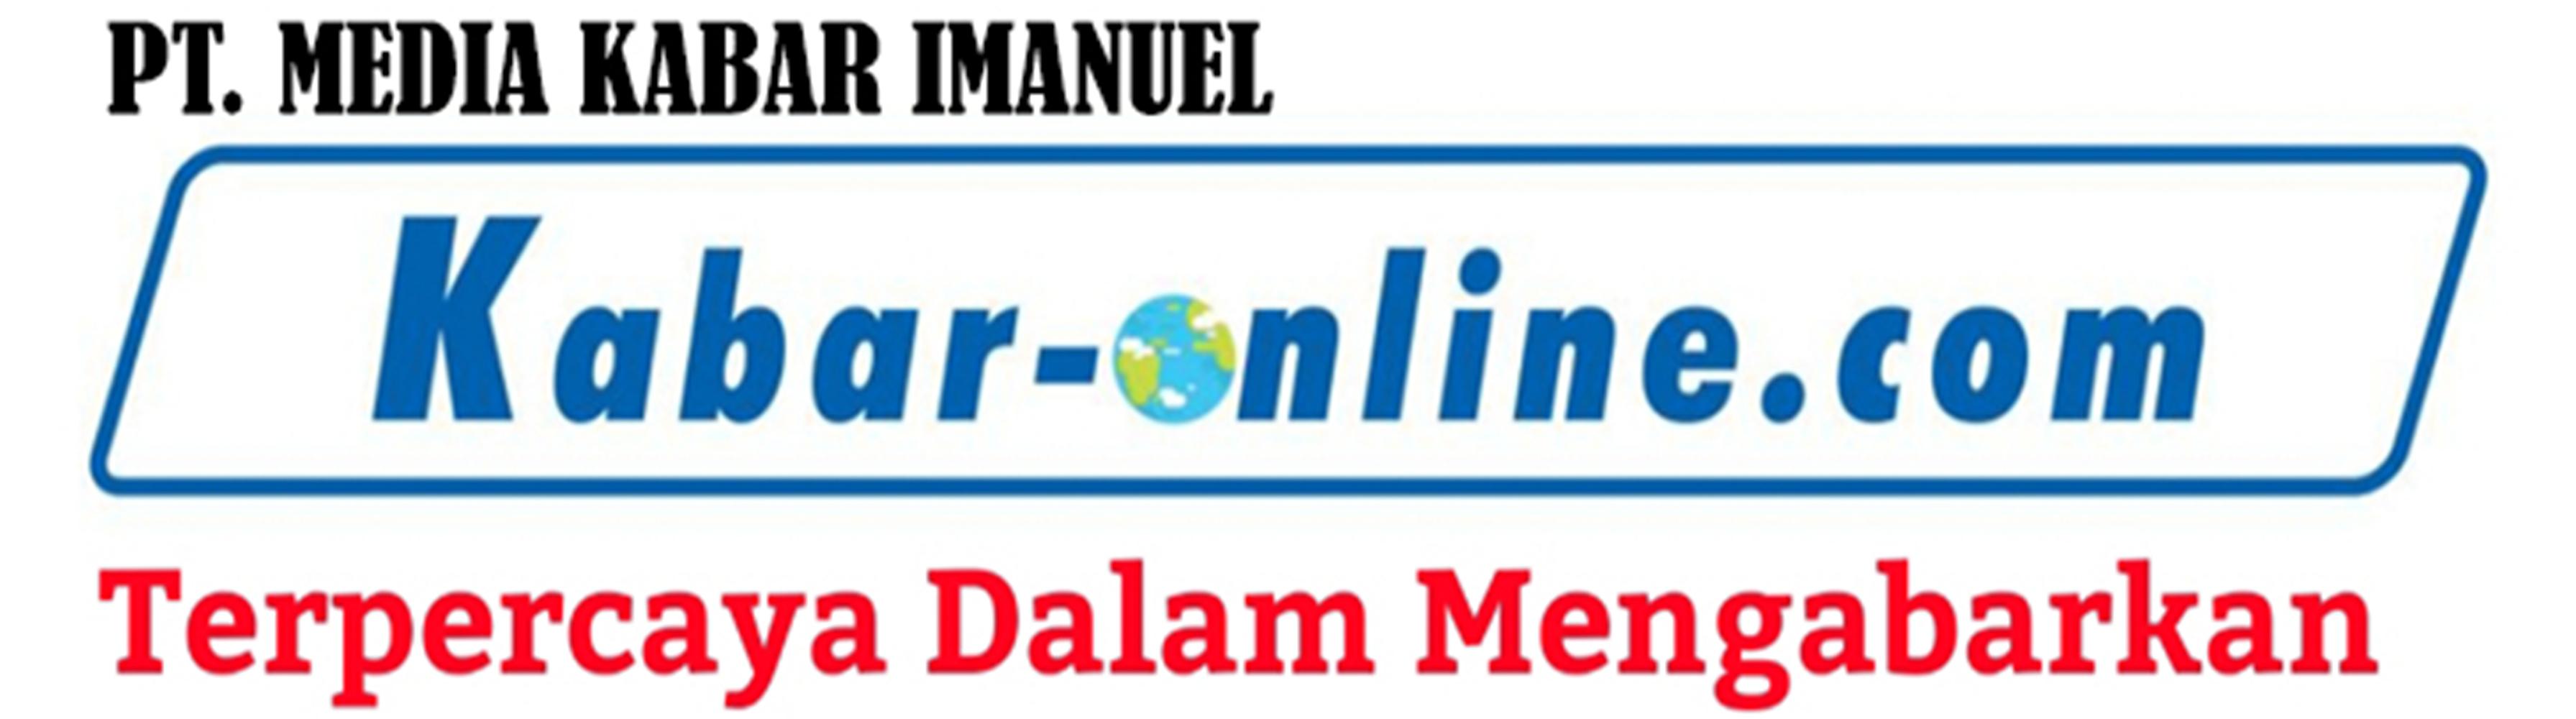 kabar-online.com